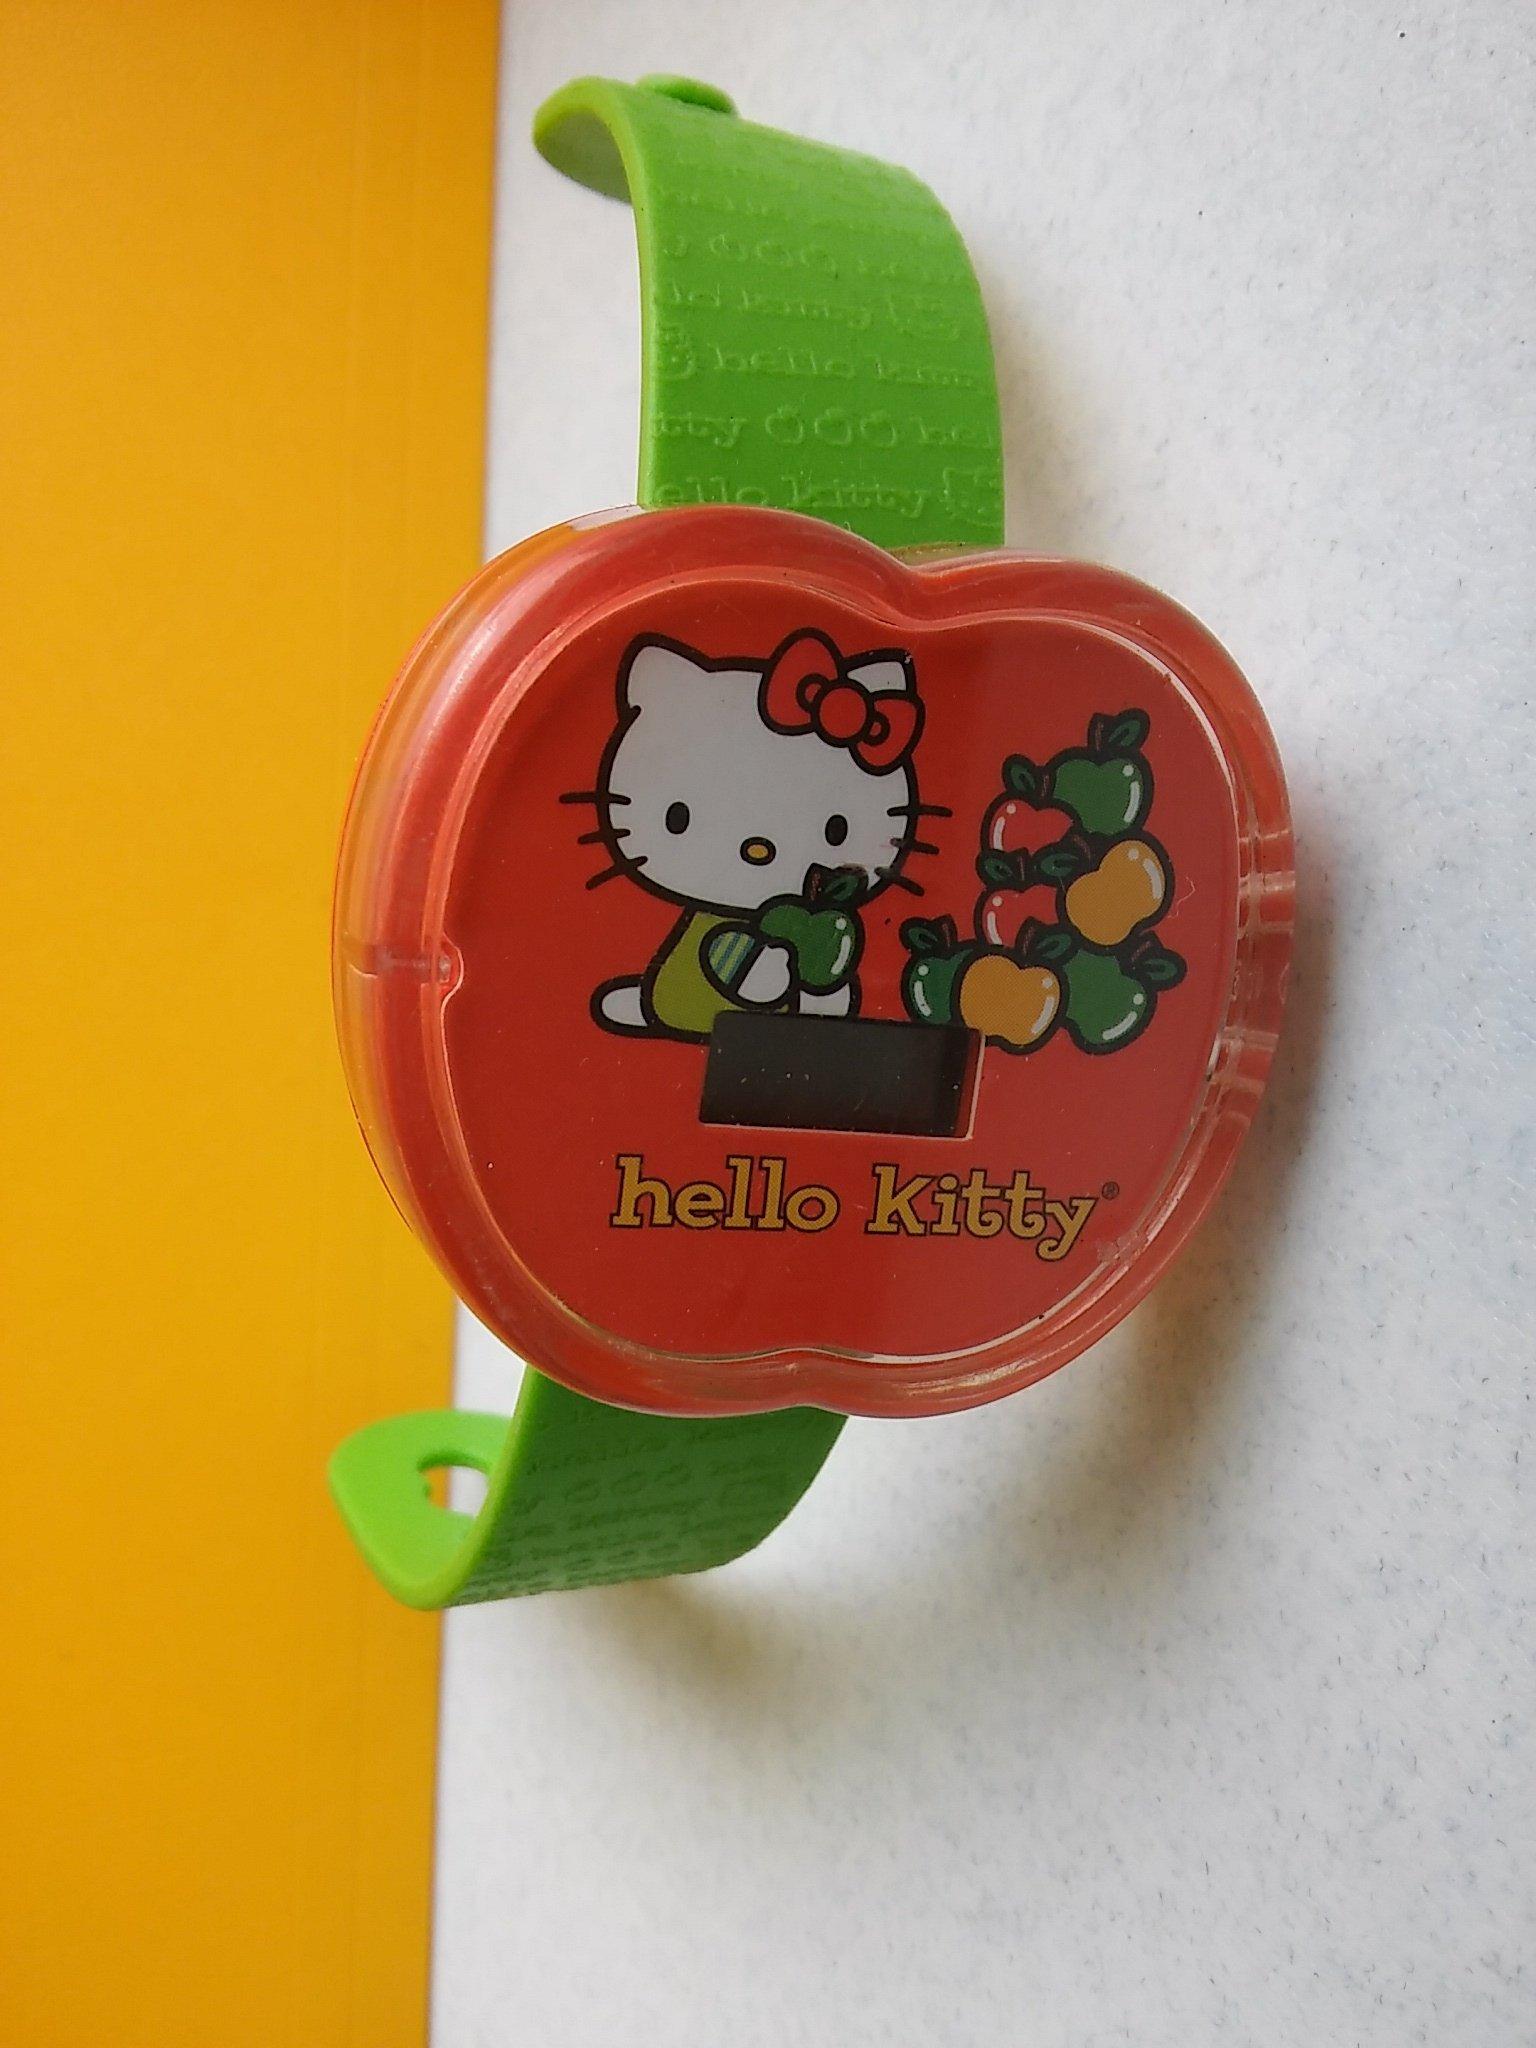 **M8-16** Hello Kitty 塑膠手錶/表面有使用痕跡,沒附電池,不知好壞是否可動/能接受物況再下標